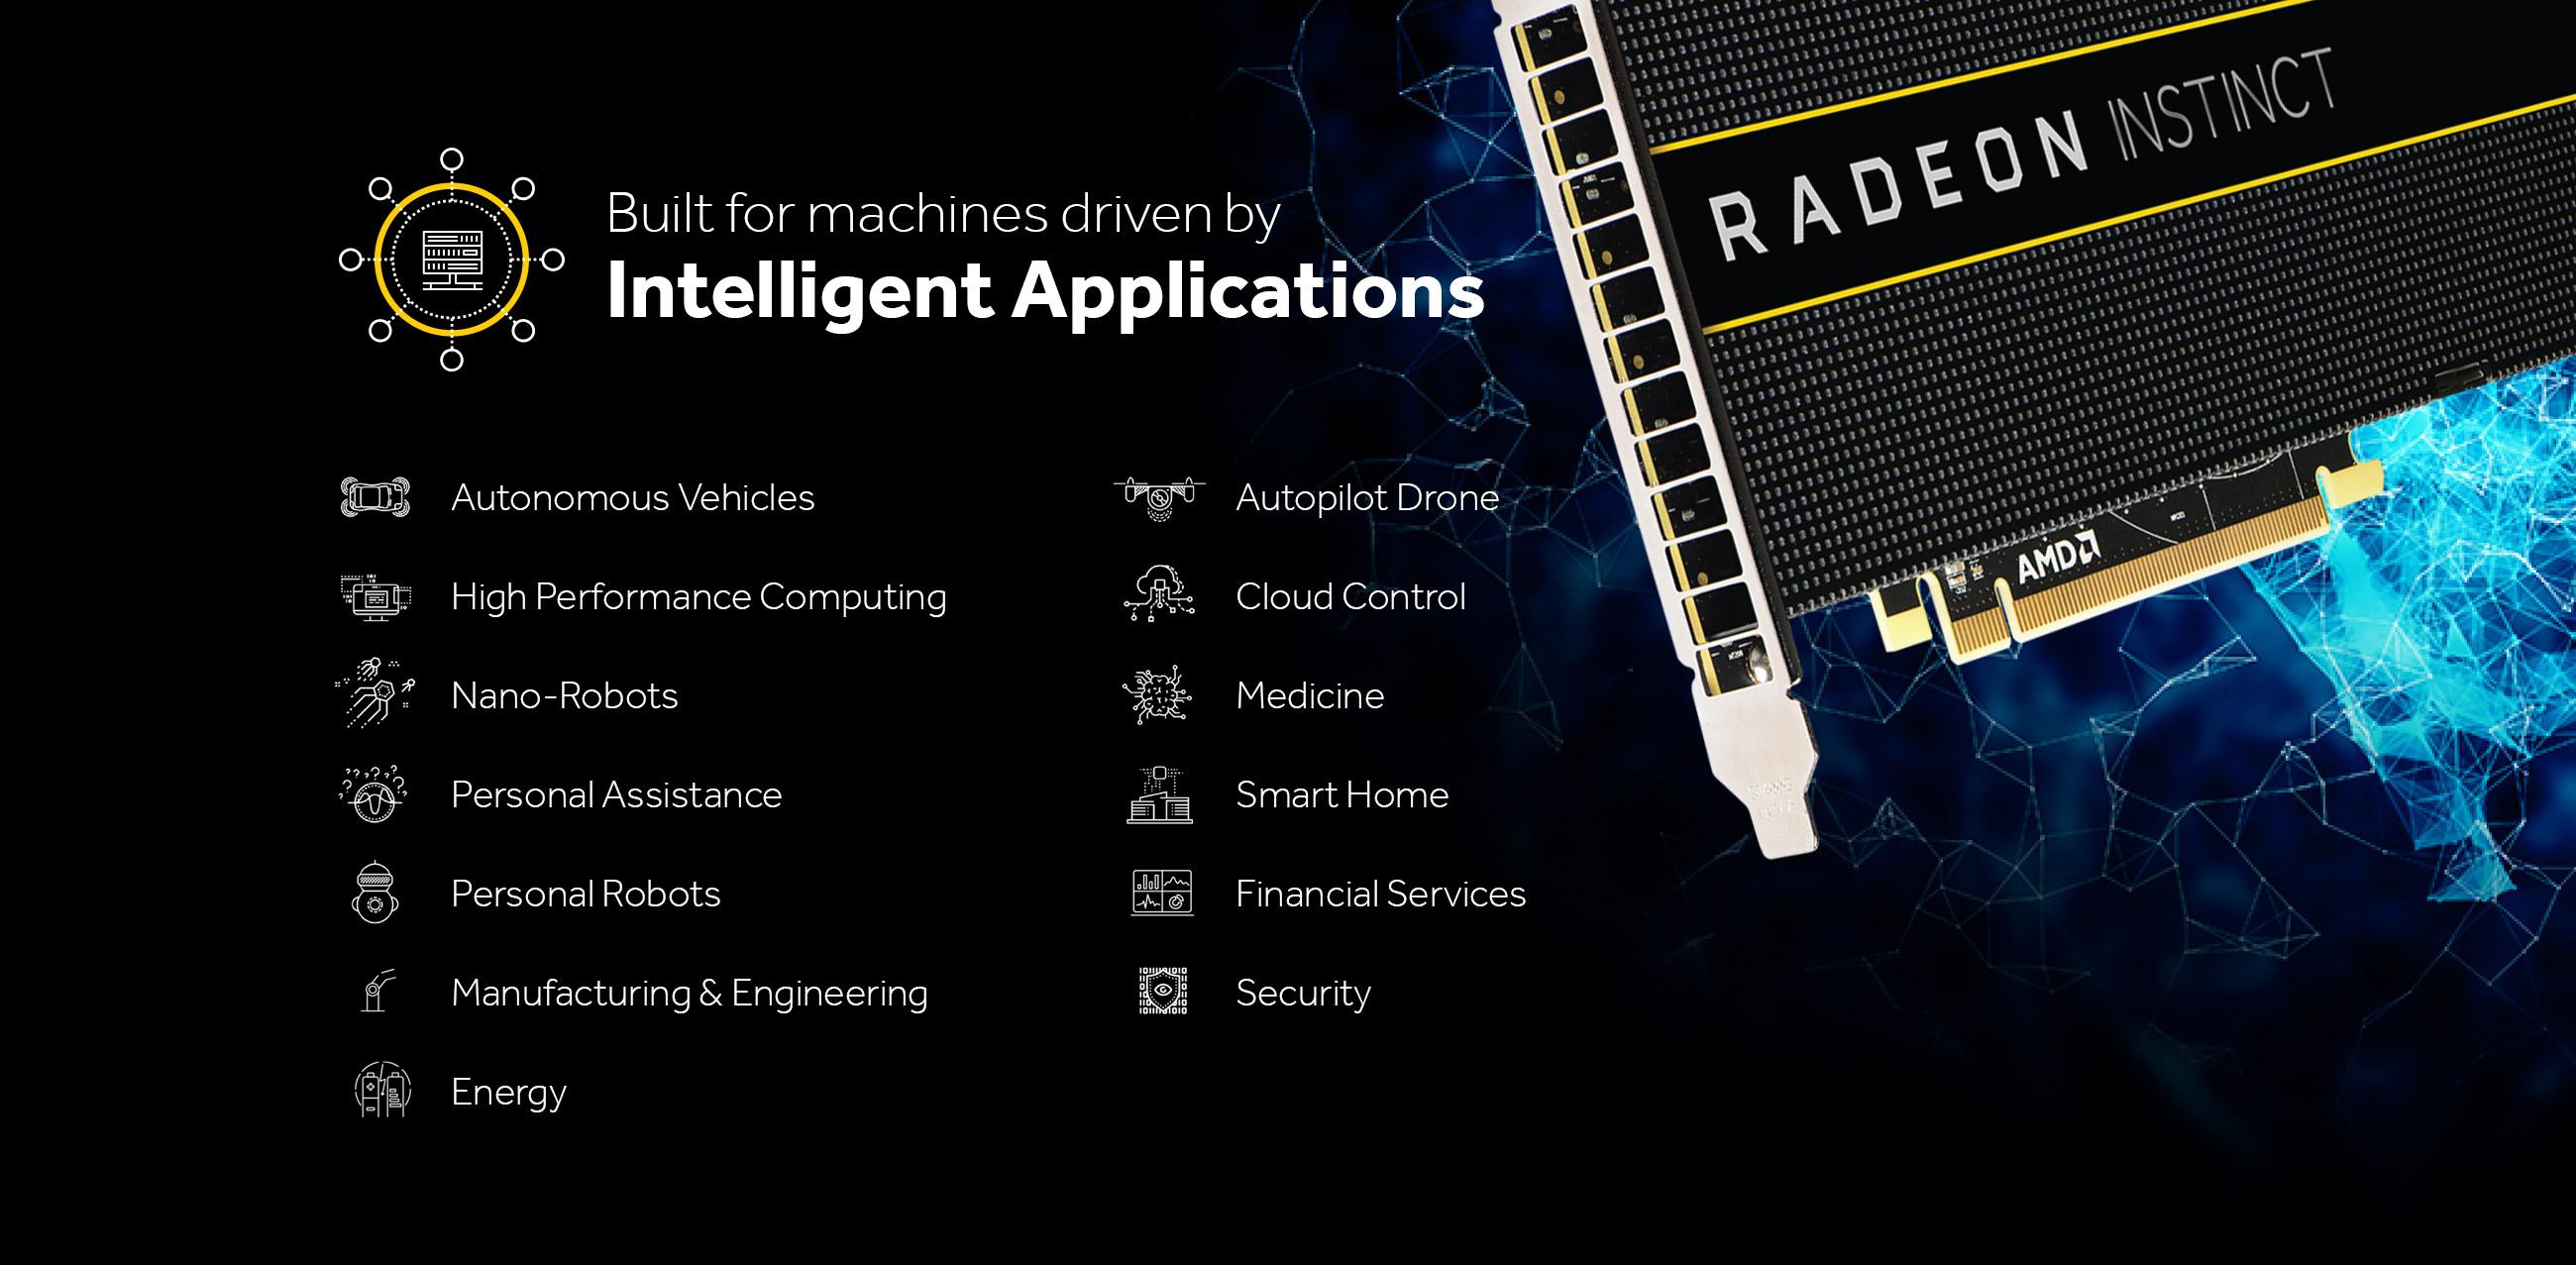 AMD Radeon Instinct GPU.